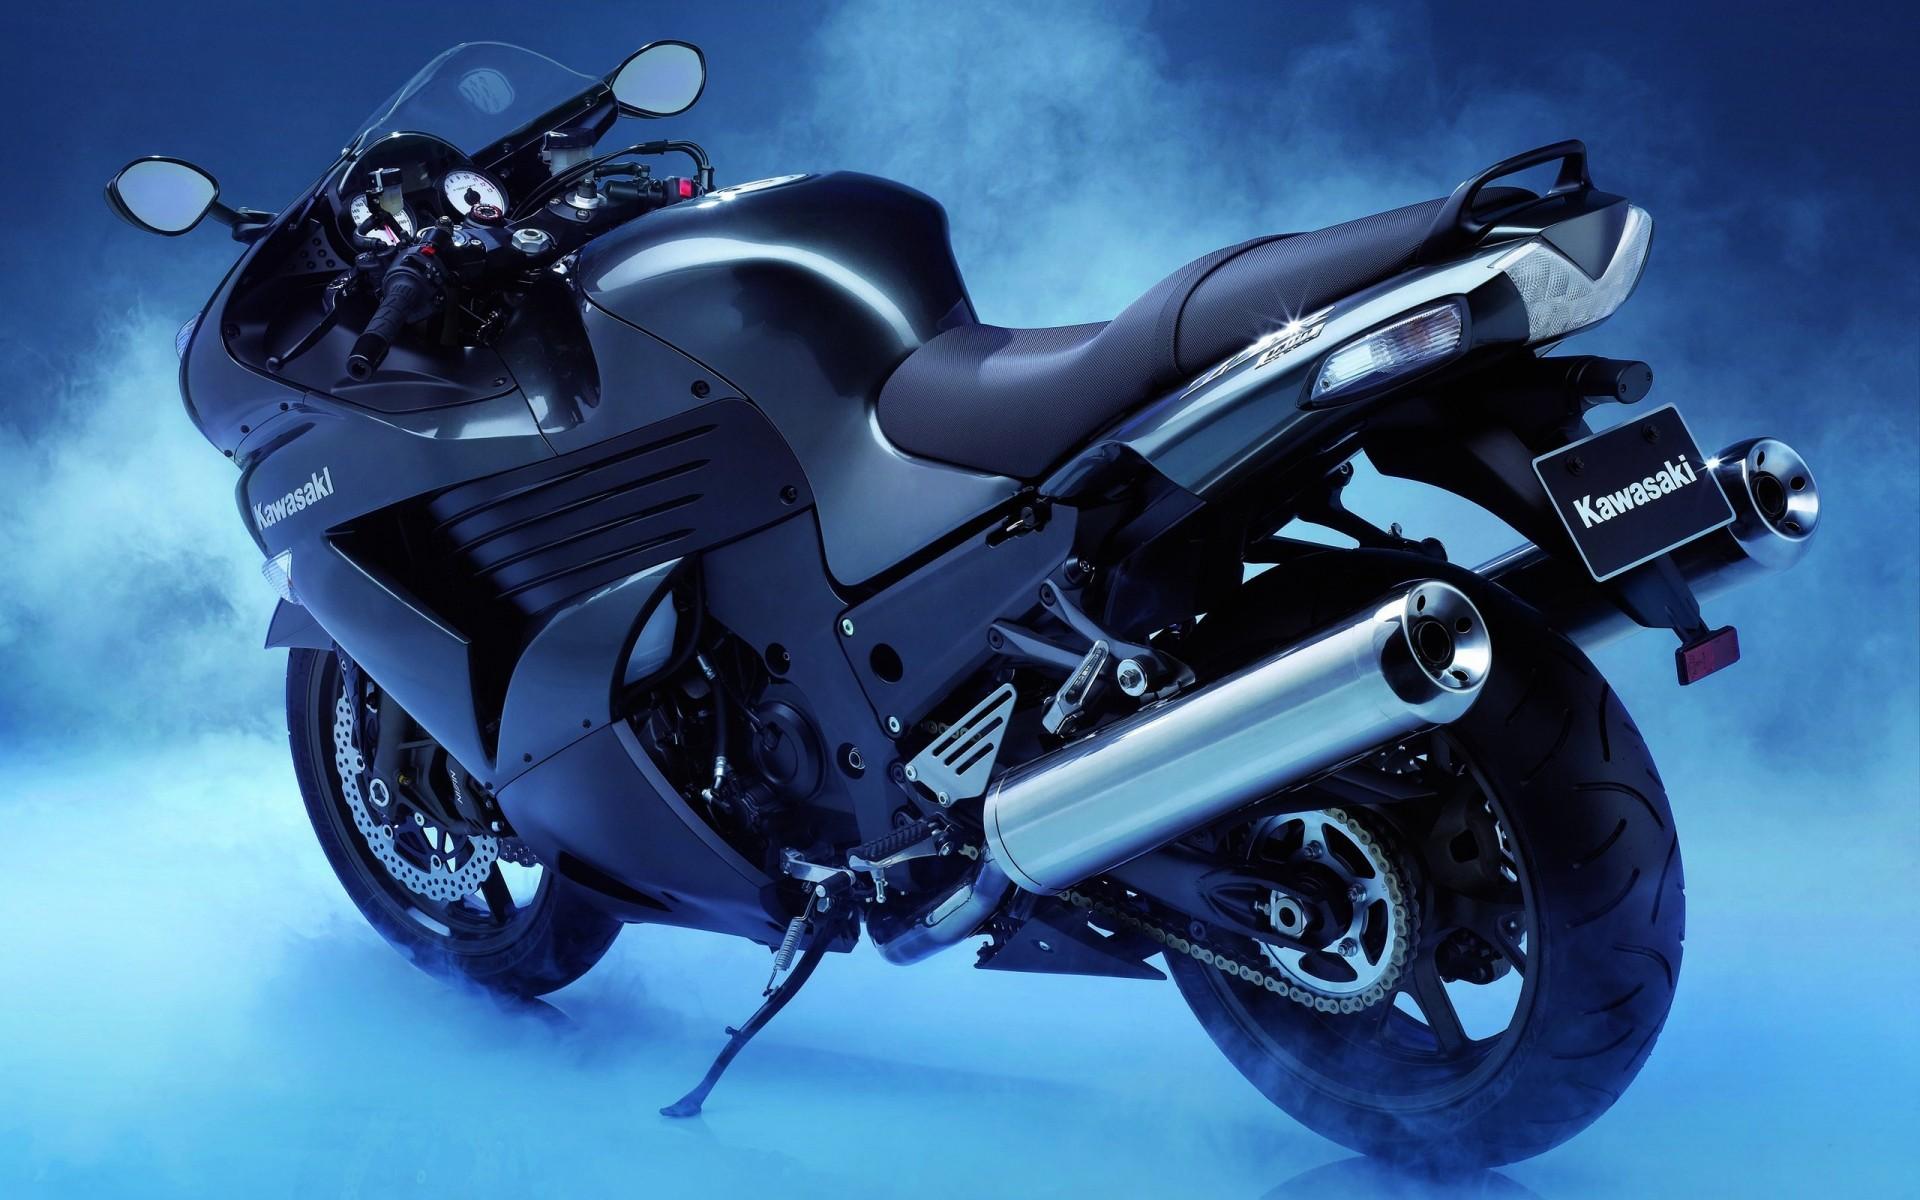 Kawasaki Ninja Black Android Wallpapers For Free